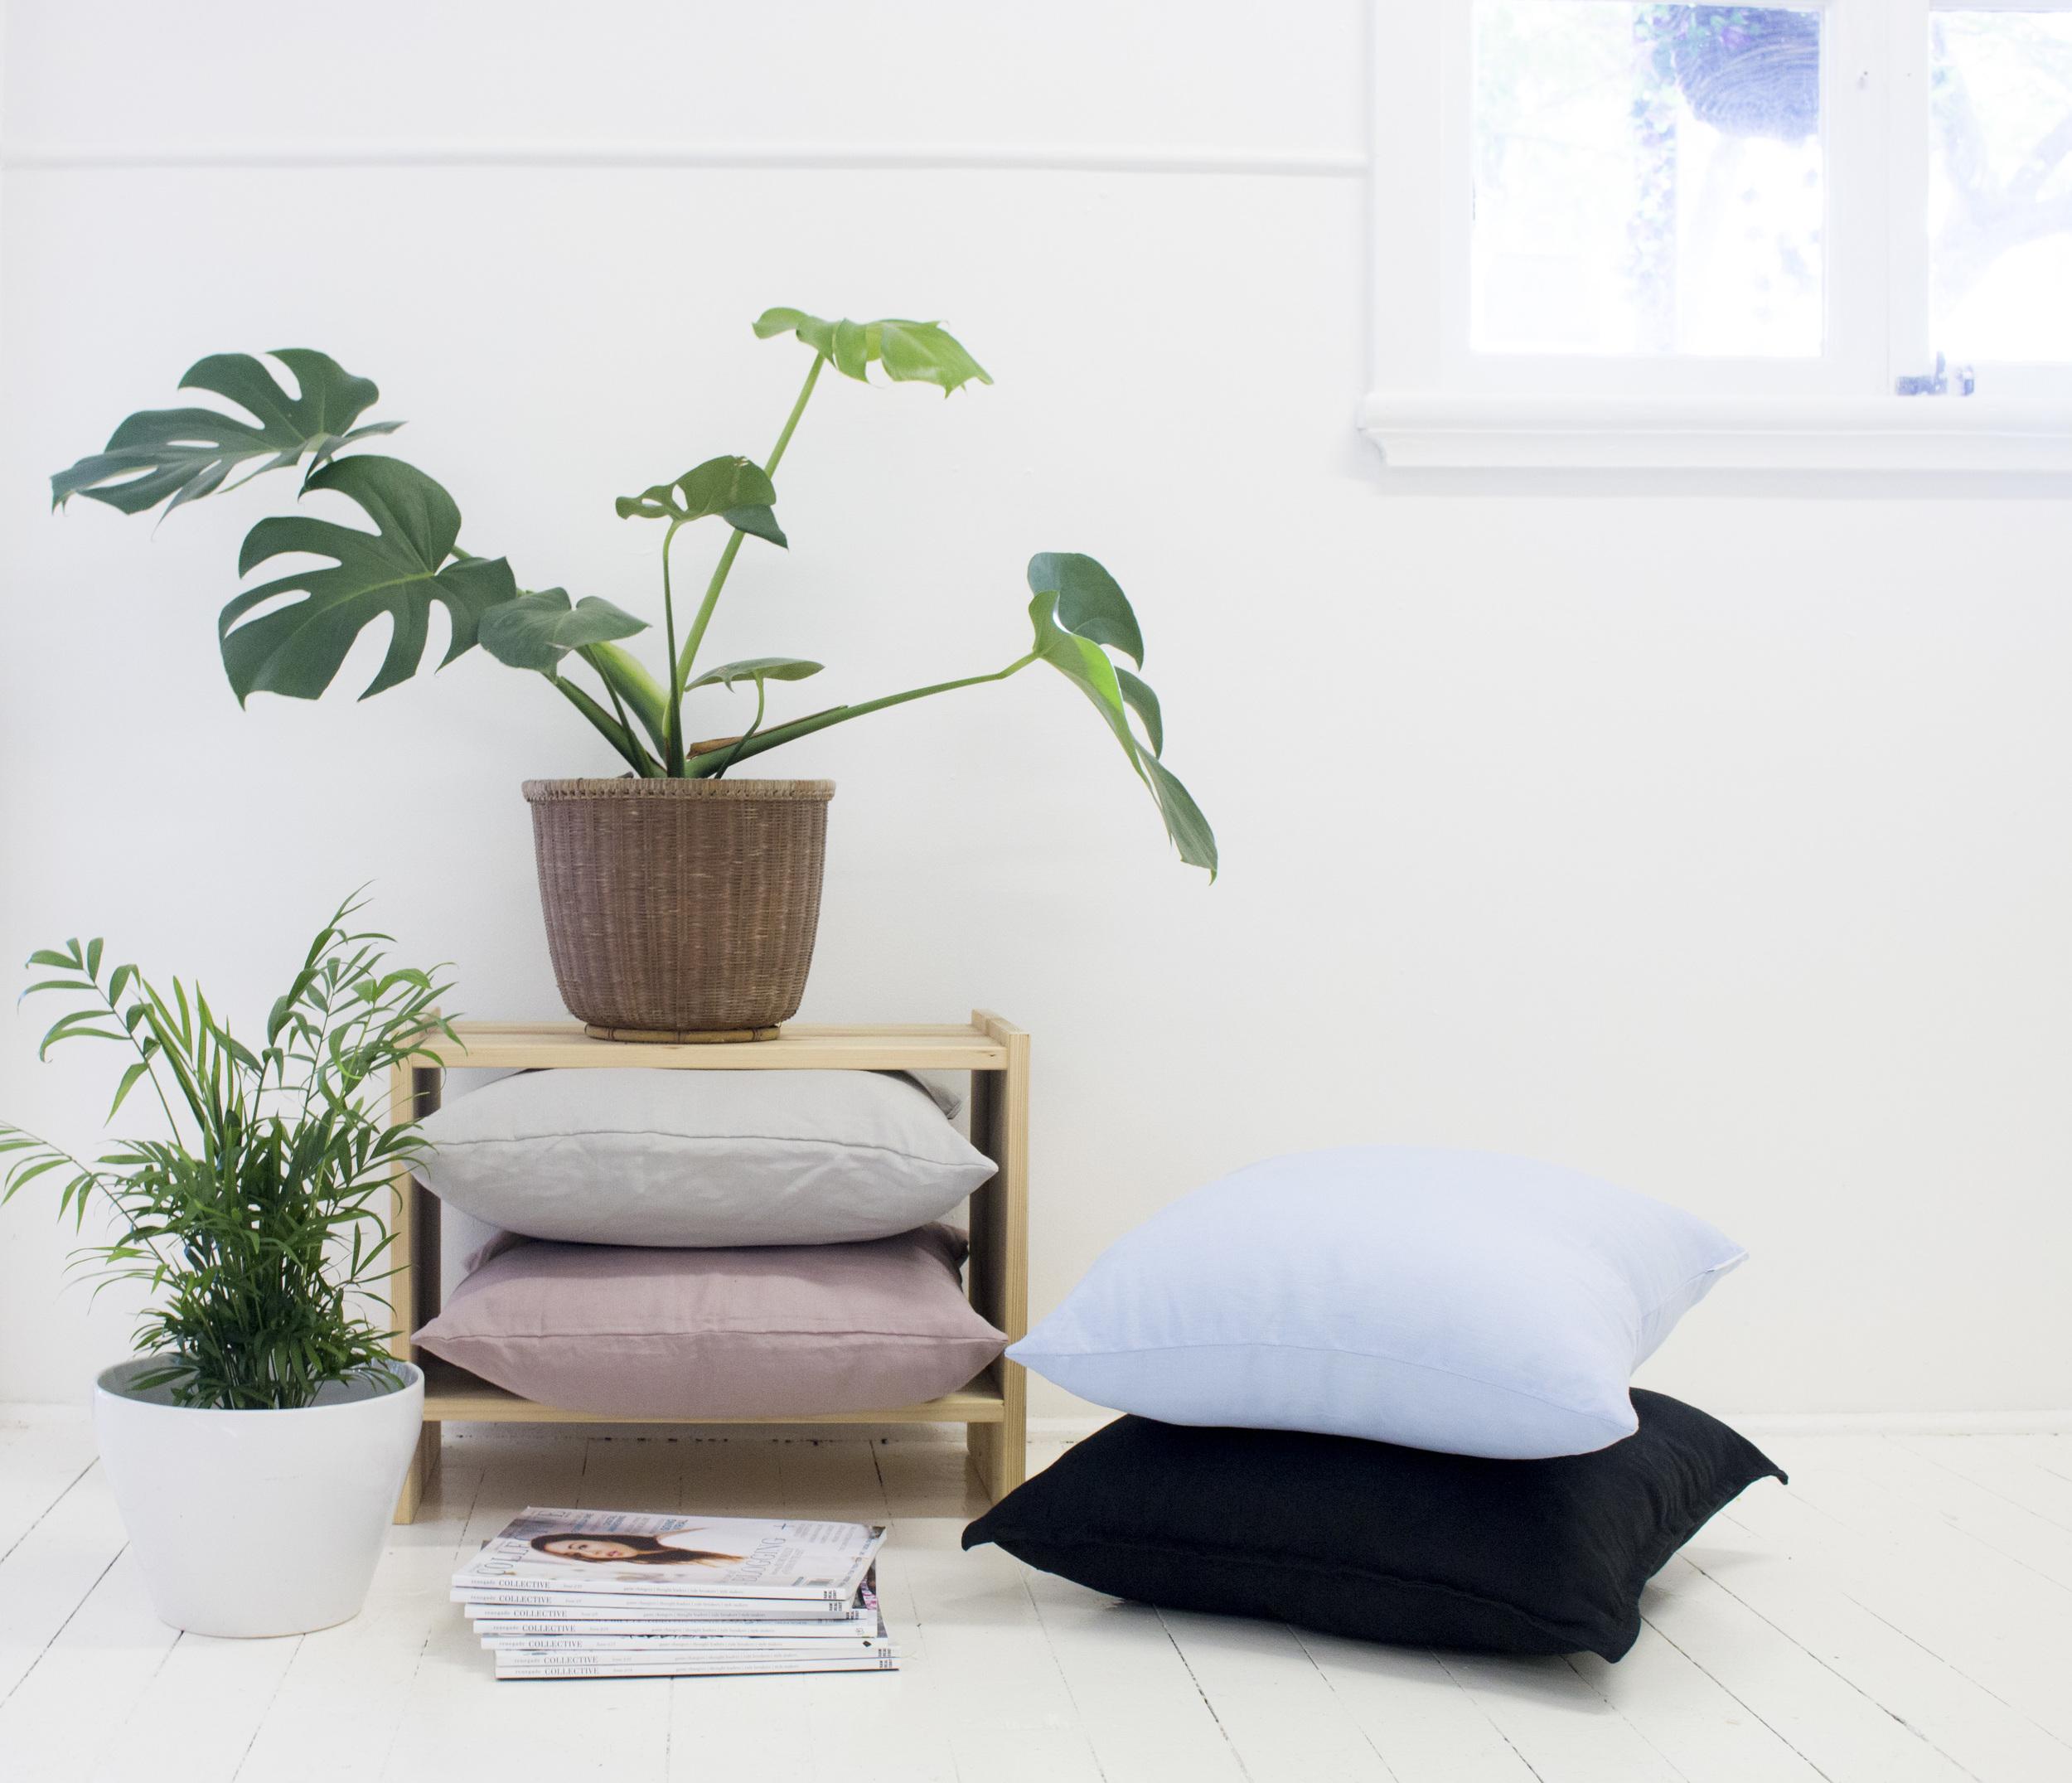 Product Photography & Styling Cushions -  Lamb & Stine